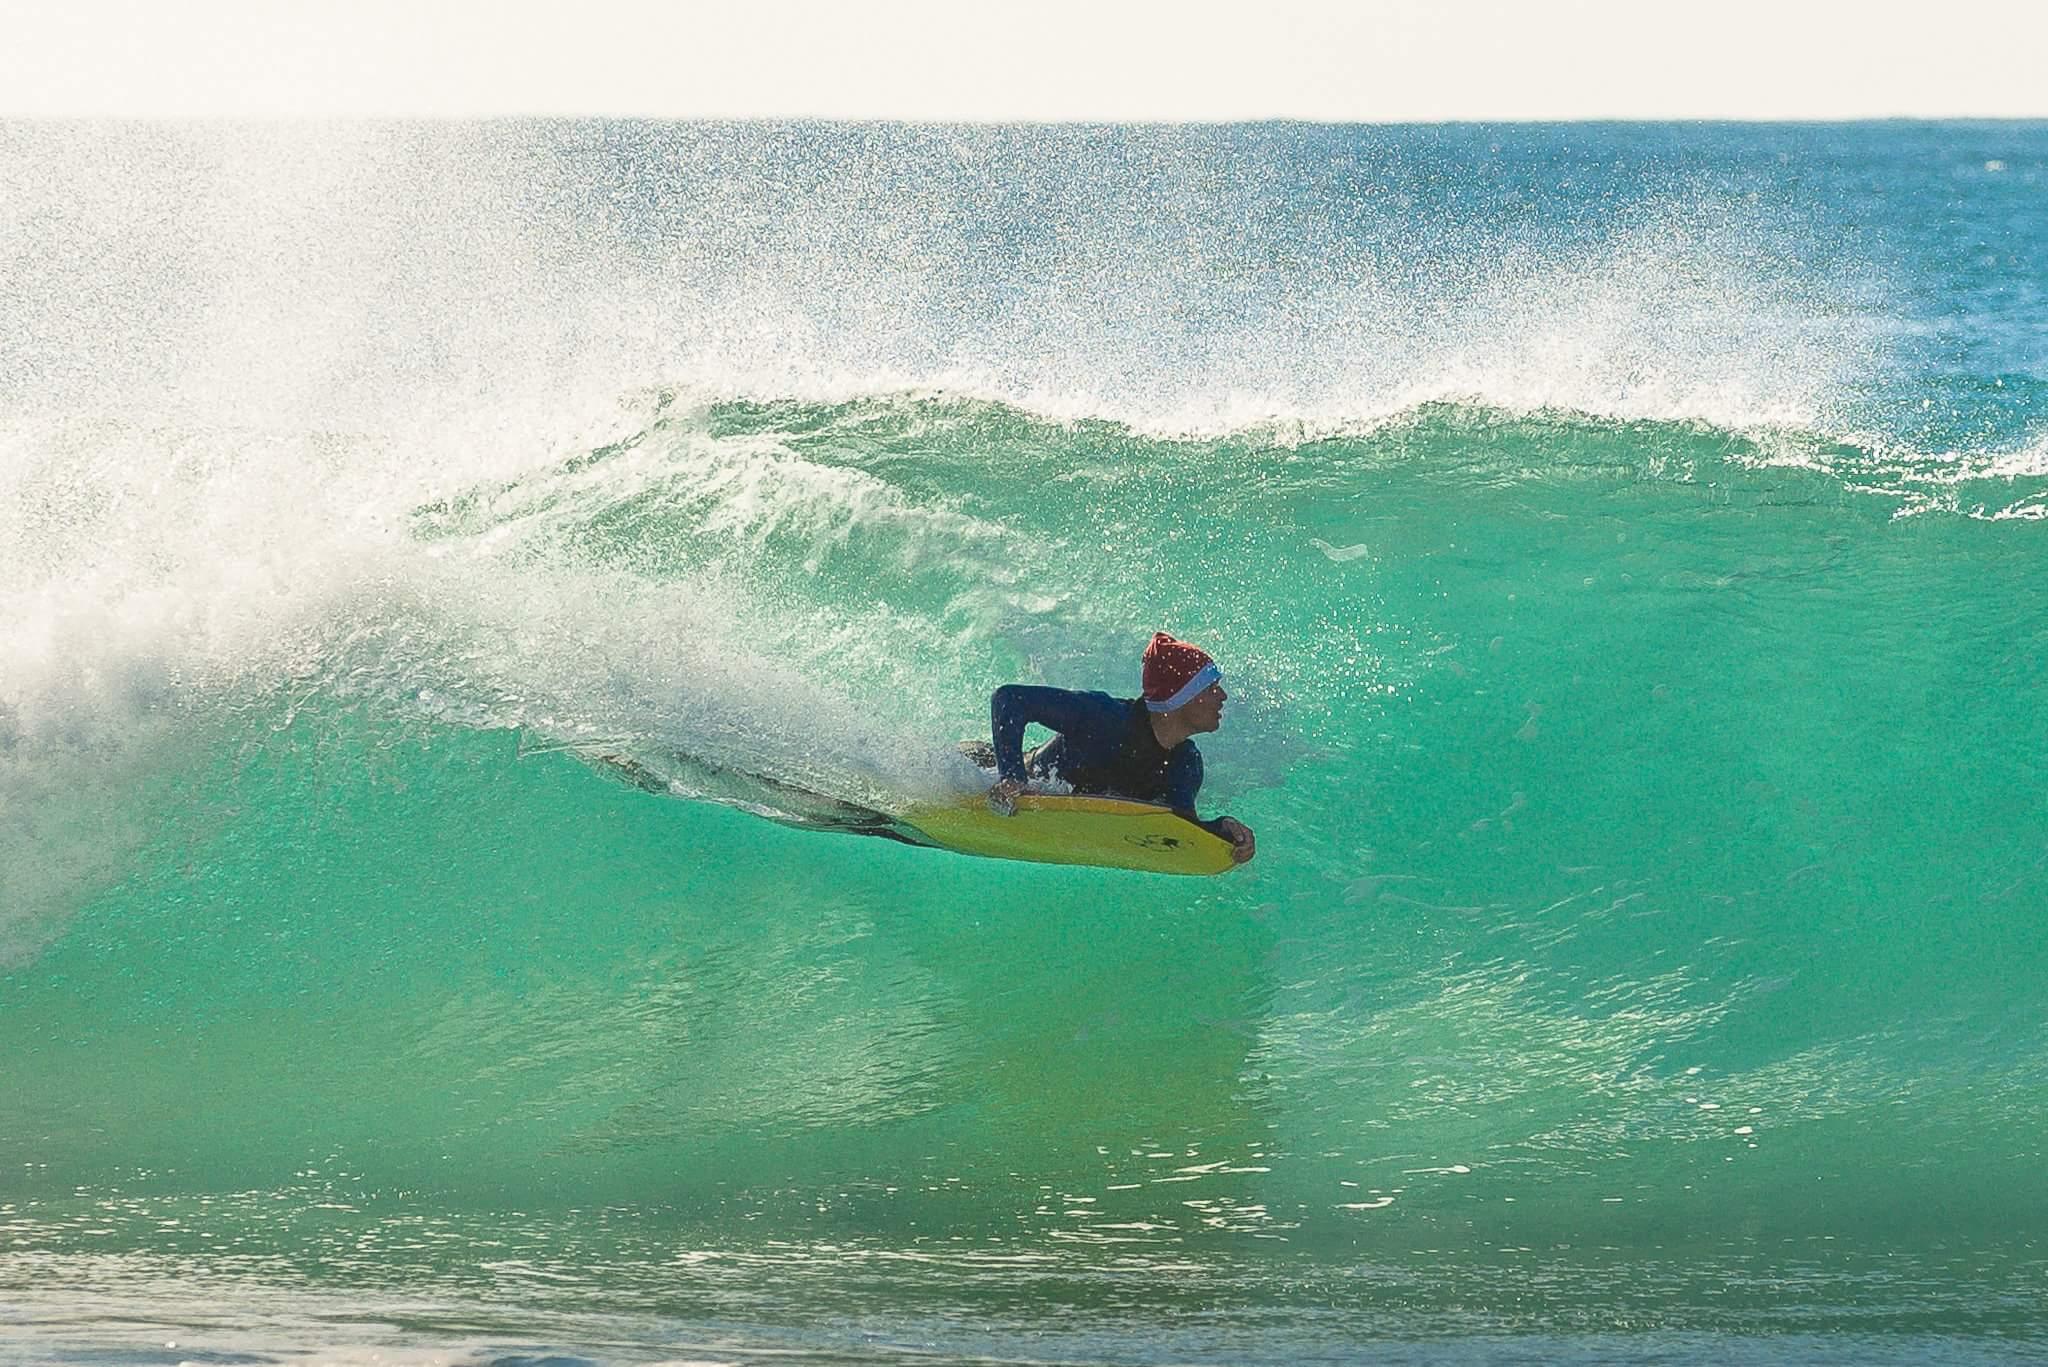 Surfing Santa Claus Portugal